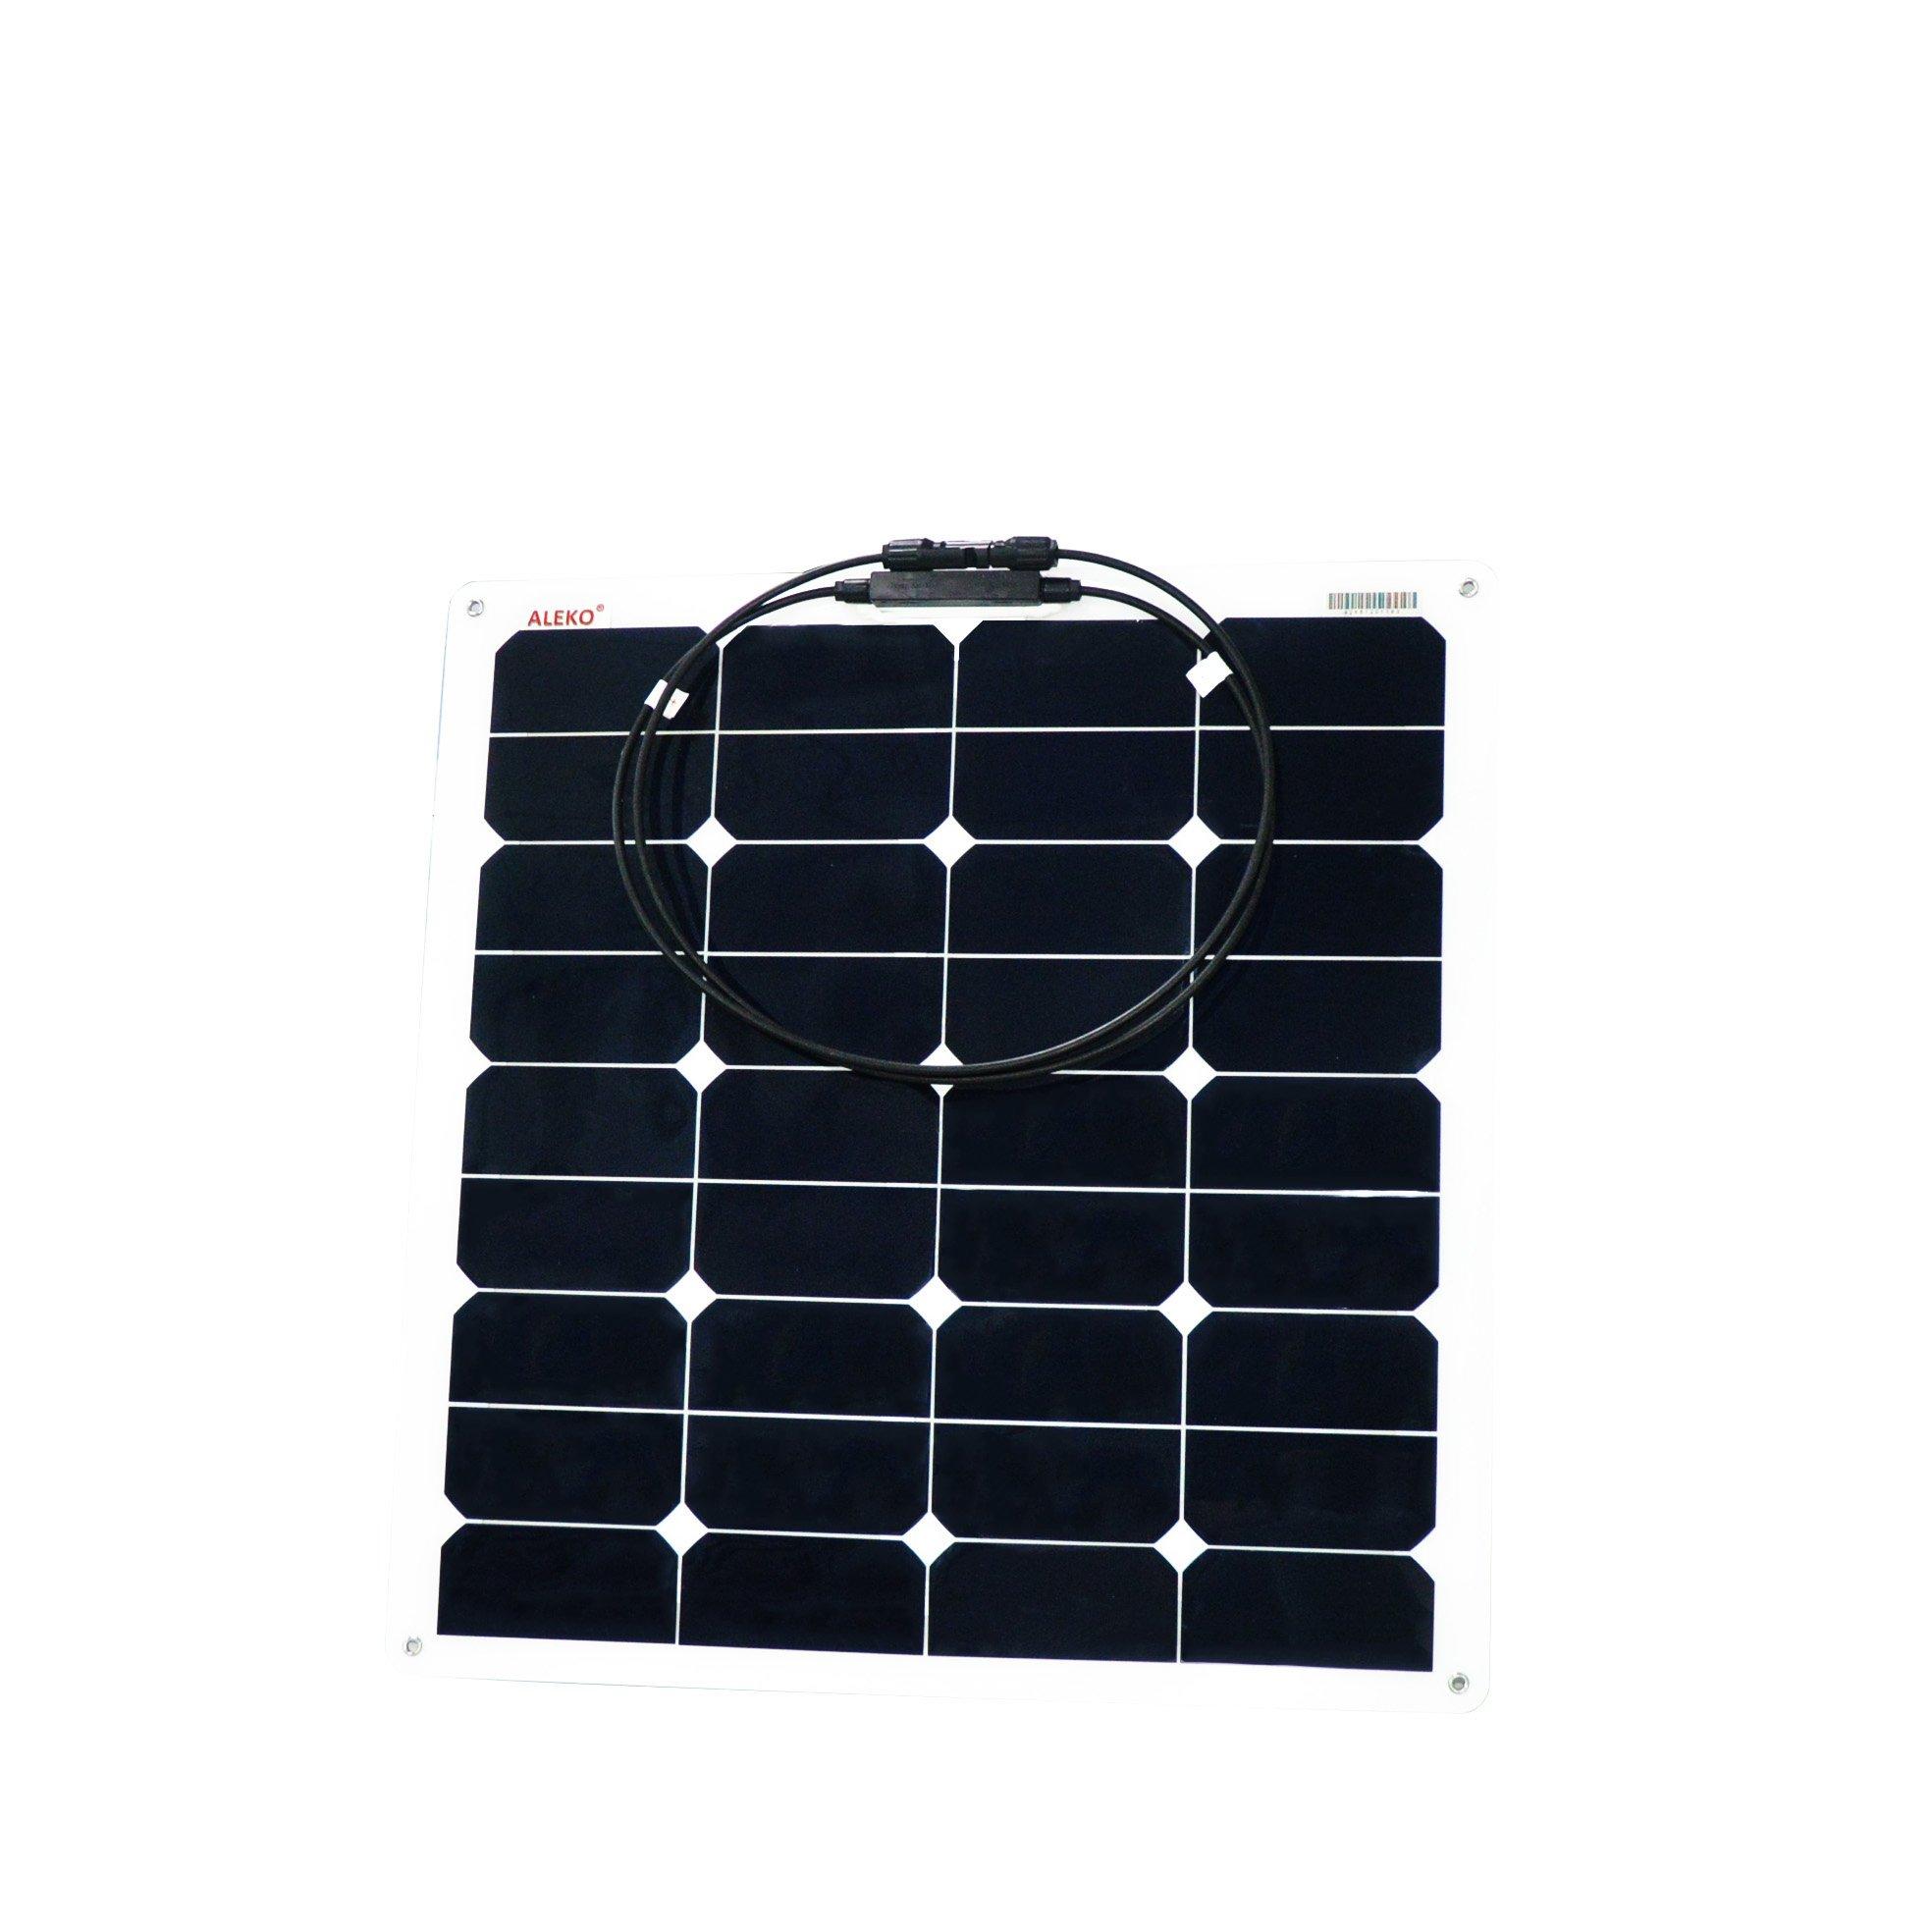 ALEKO SP50W12VFLEX 50 Watt 12 Volt Monocrystalline Semi Flexible Solar Panel for Gate Opener Pool Garden Driveway